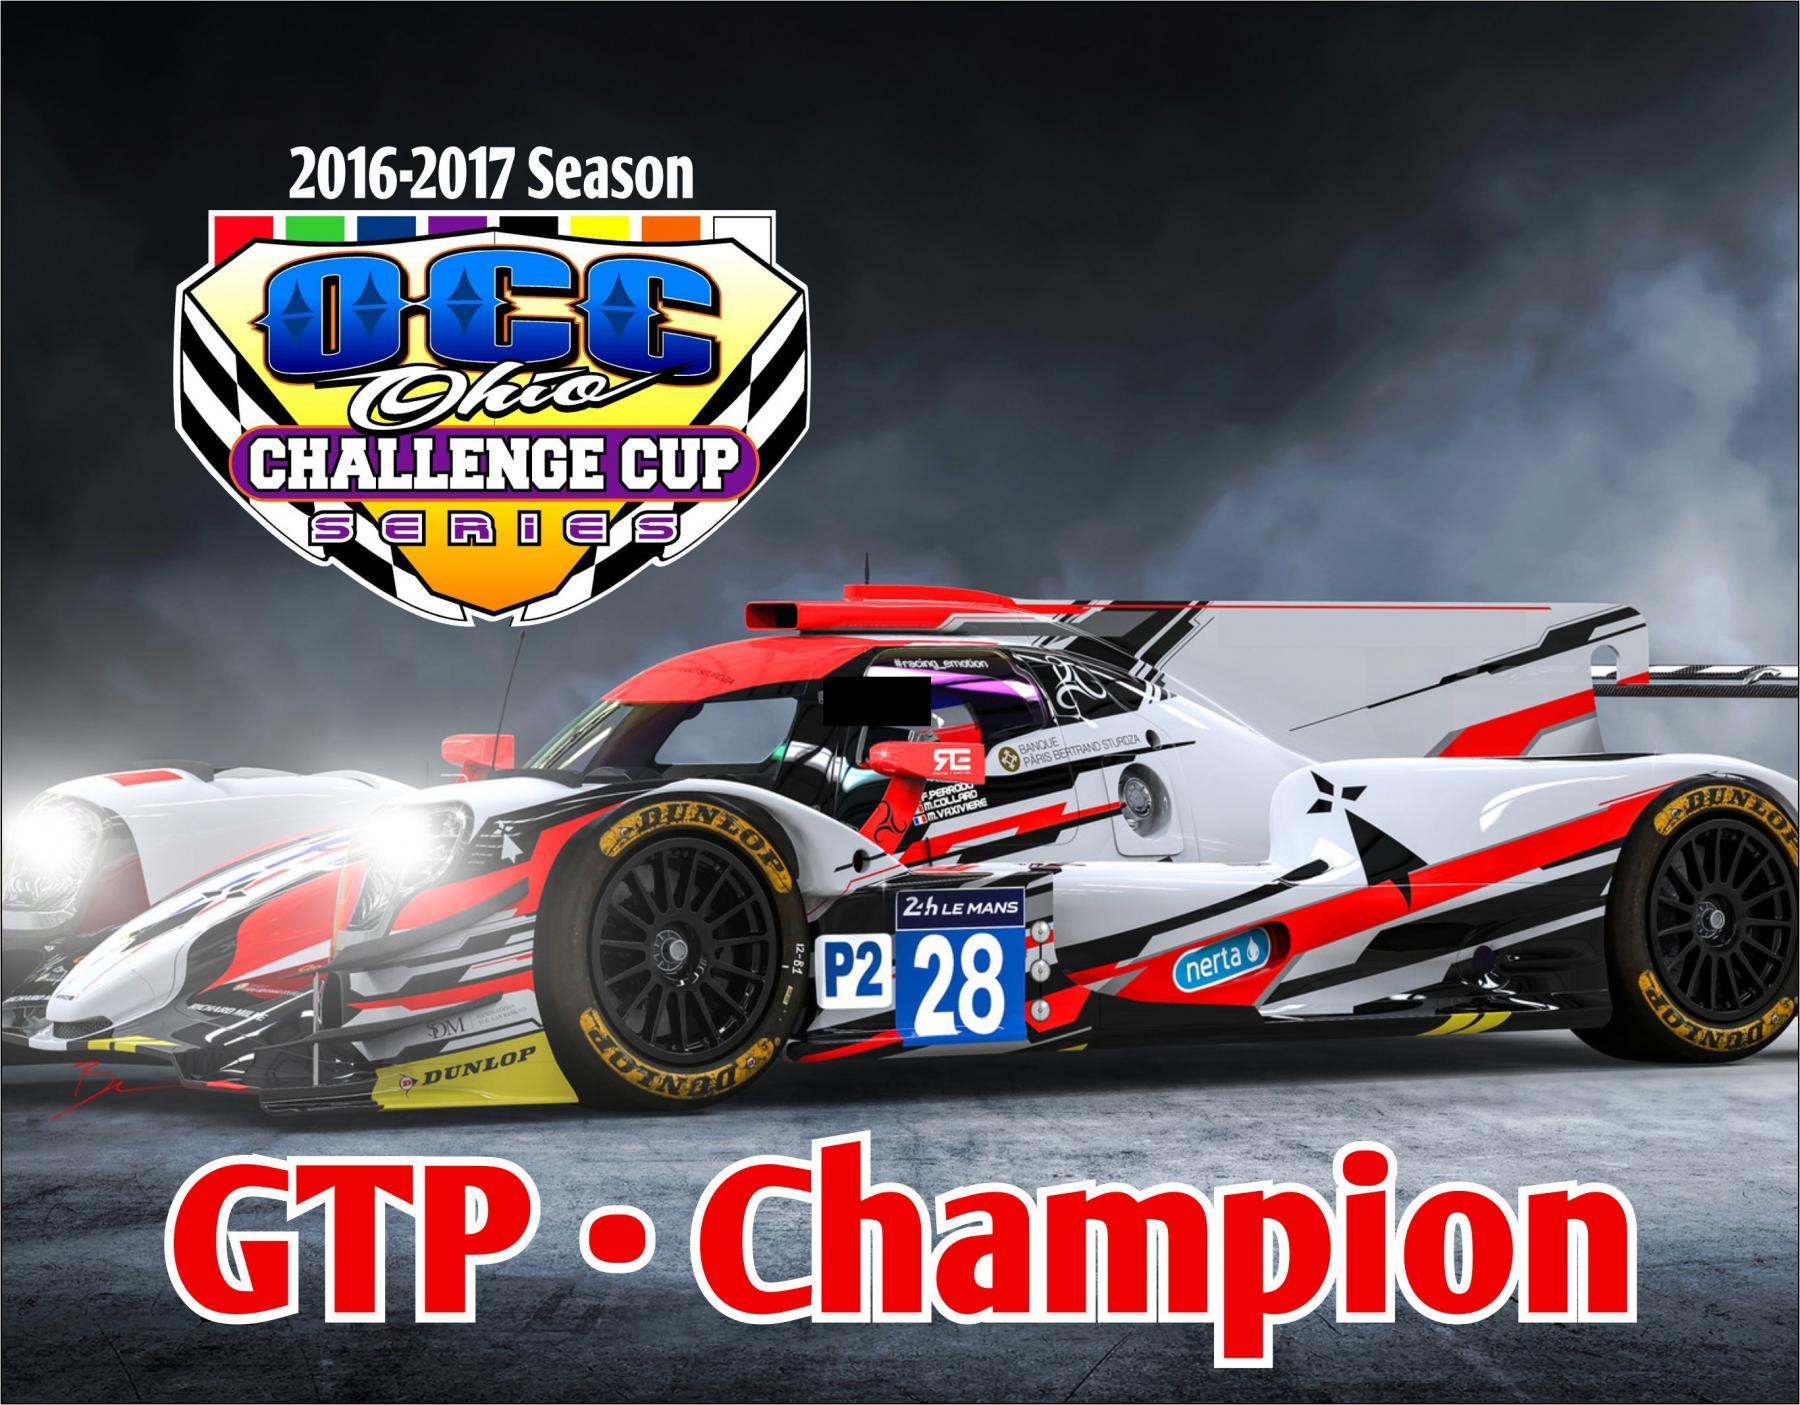 OCC 2016 2017 Series Championship.jpg